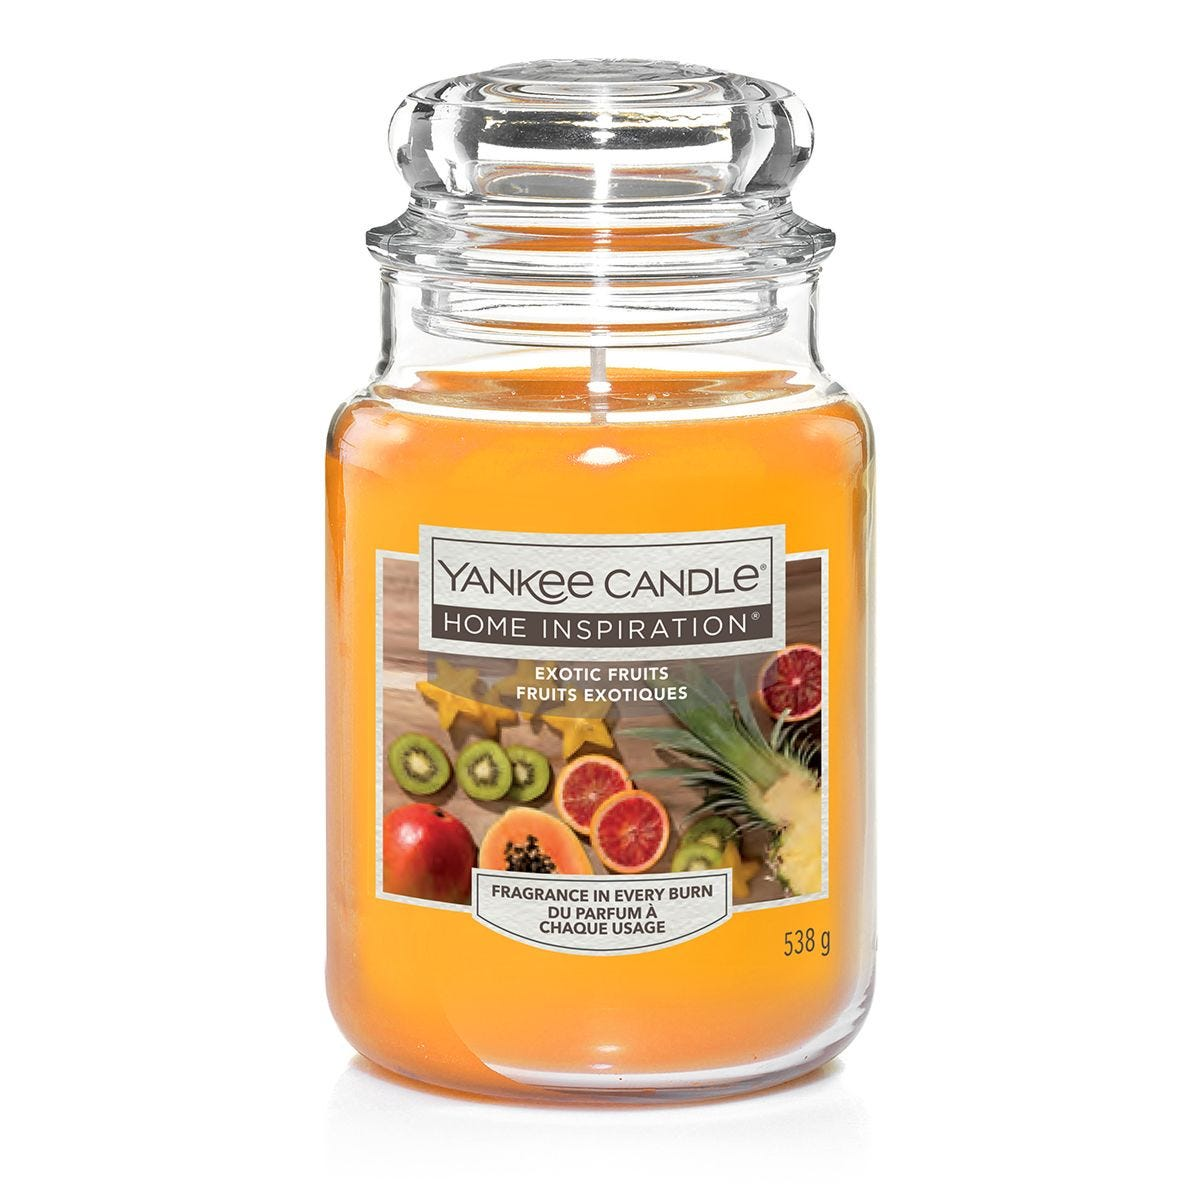 Yankee Candle Home Inspiration Exotic Fruit Large Jar Candle Robert Dyas